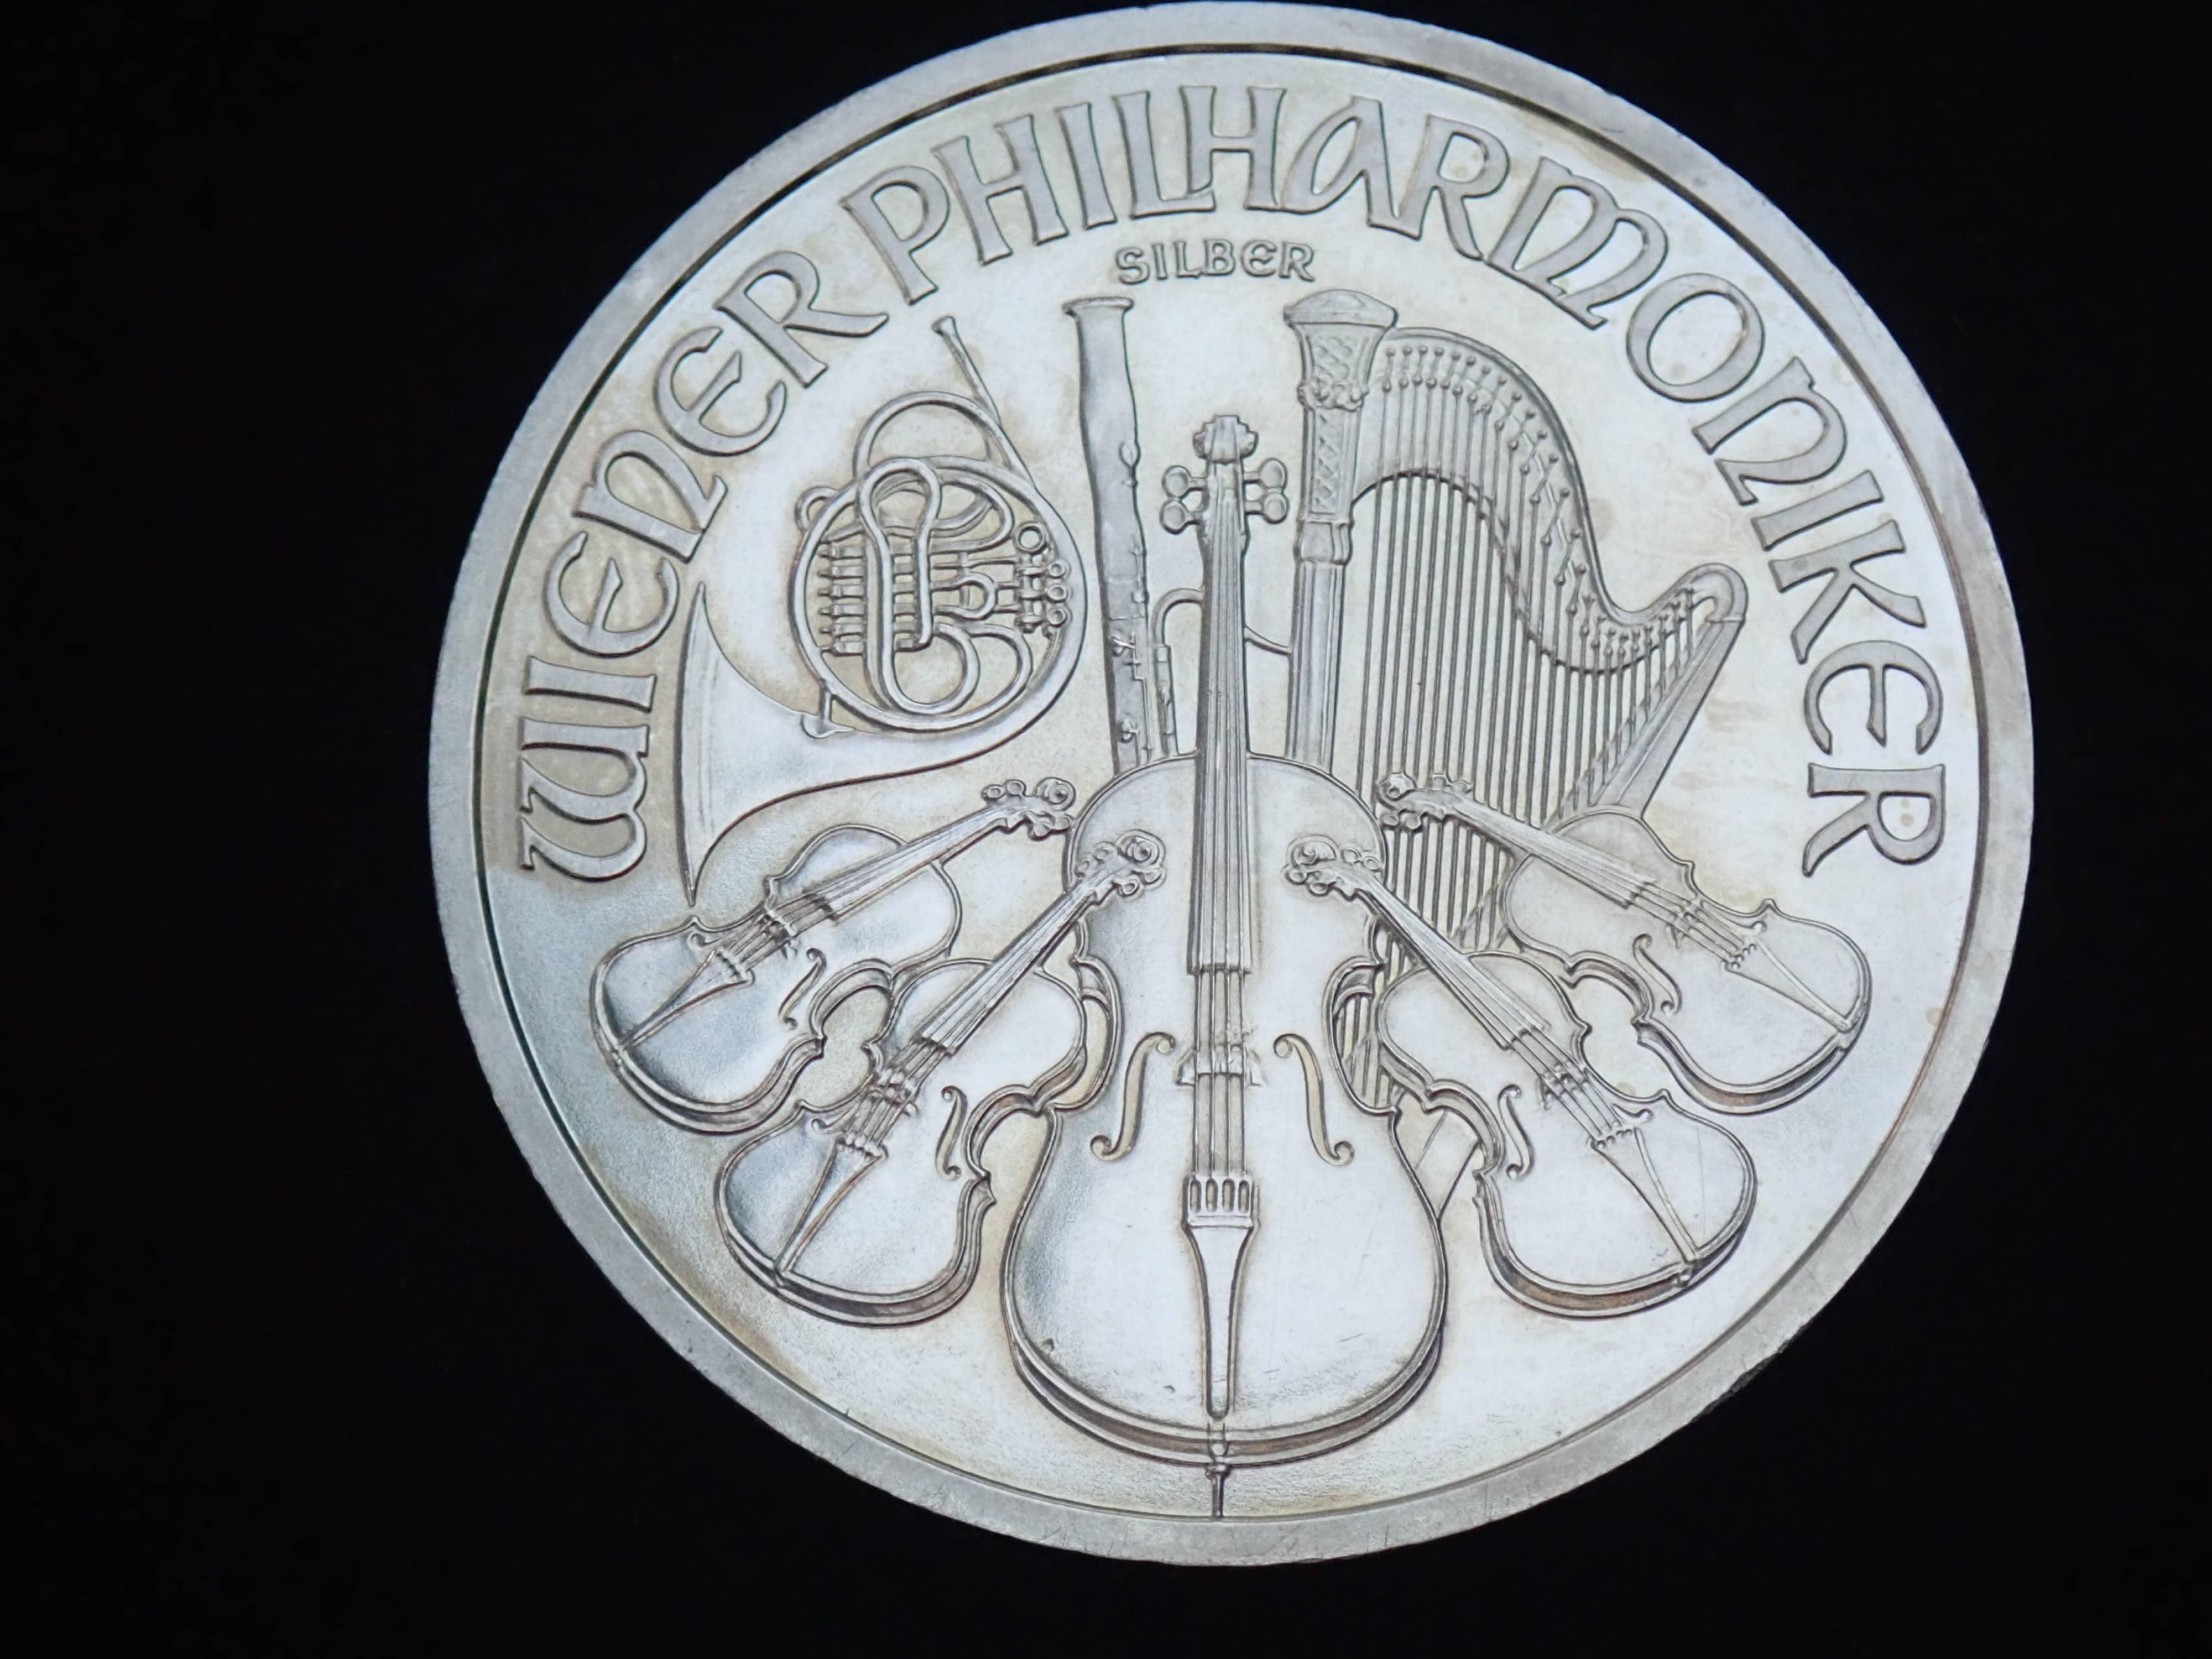 AZZ00581 - 2010 1oz Austrian Philharmonic Fine Silver 999.9 Coin #21